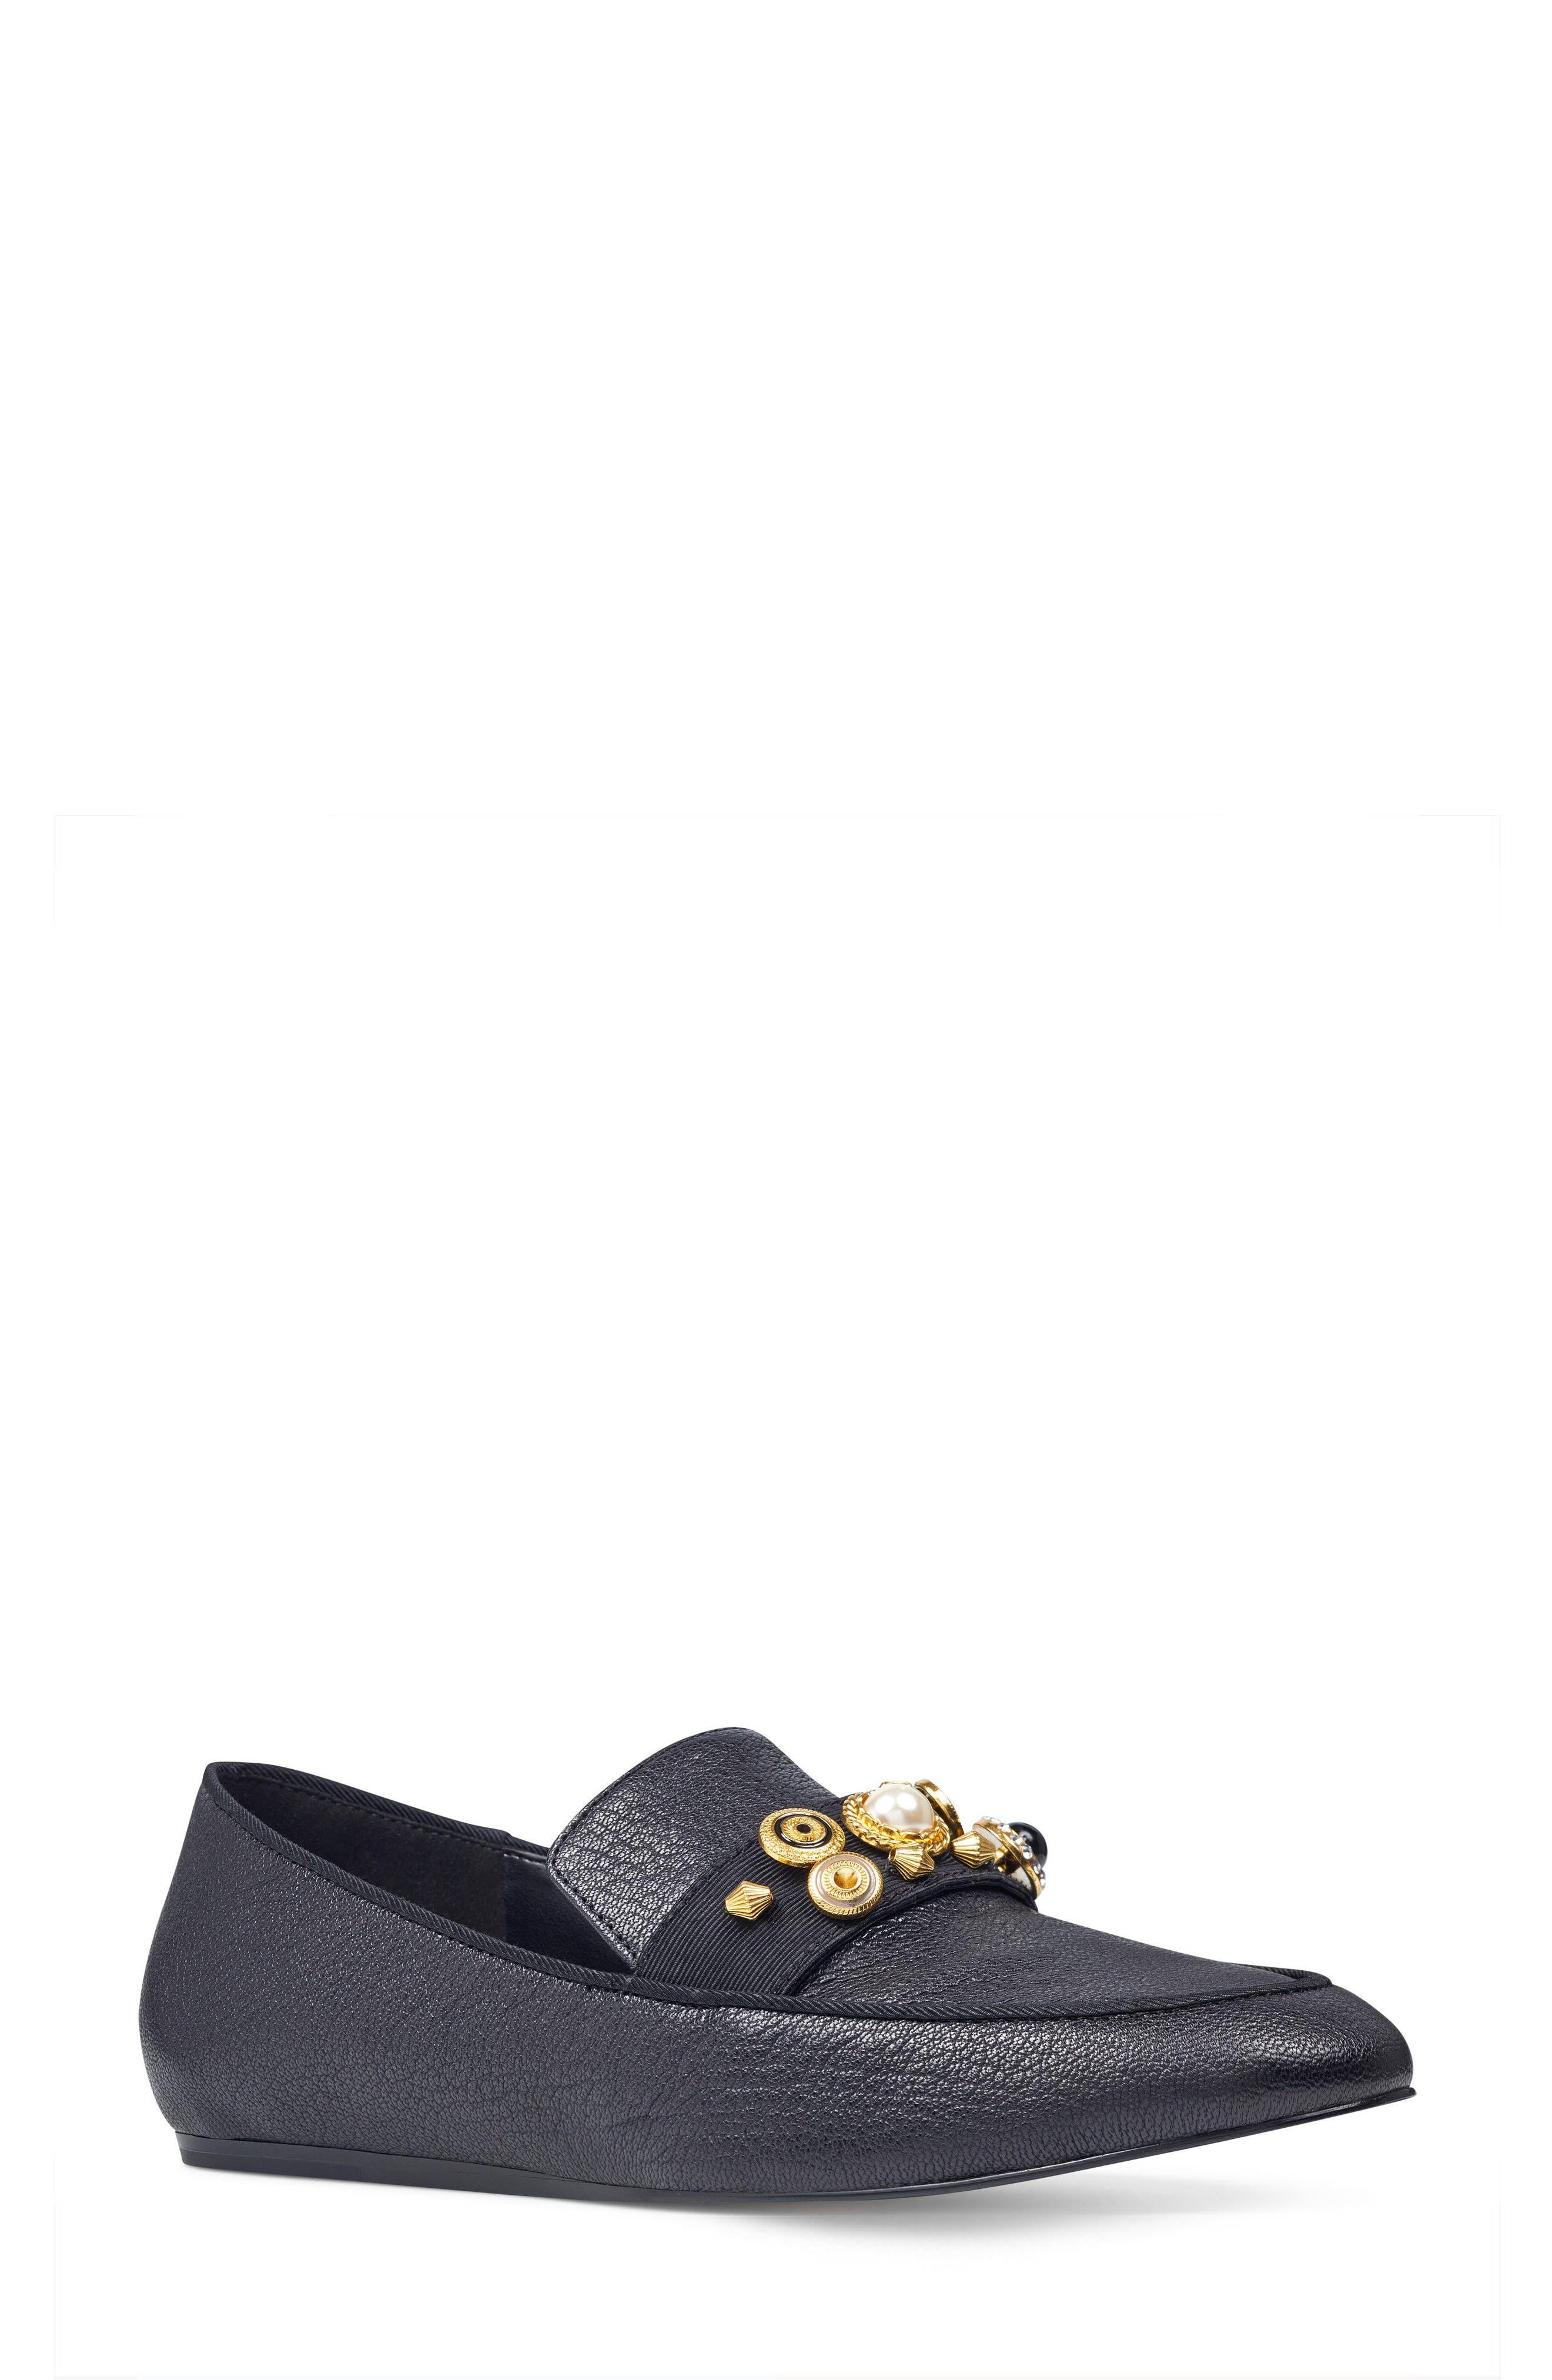 Baus Loafer Flat,                             Main thumbnail 1, color,                             Black/ Black Leather